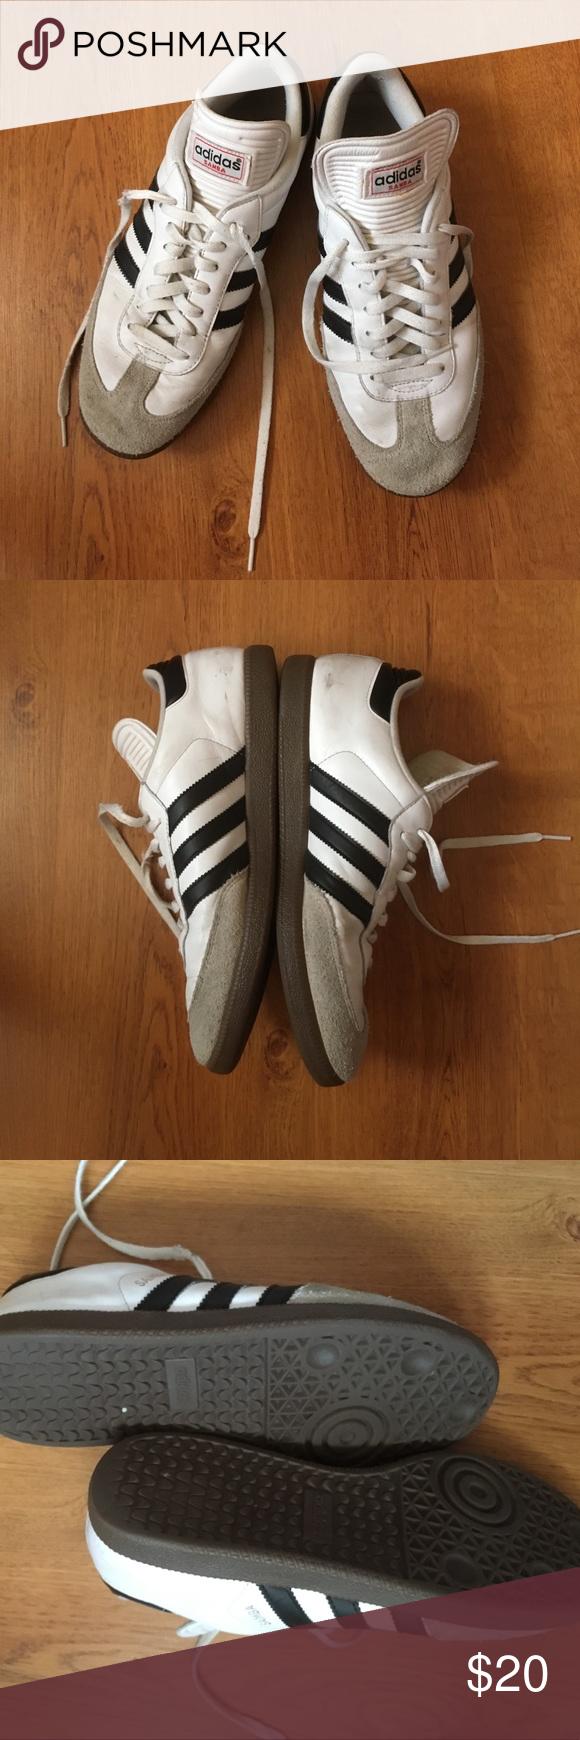 mens adidas samba scarpa da tennis il classico stile adidas samba tennis